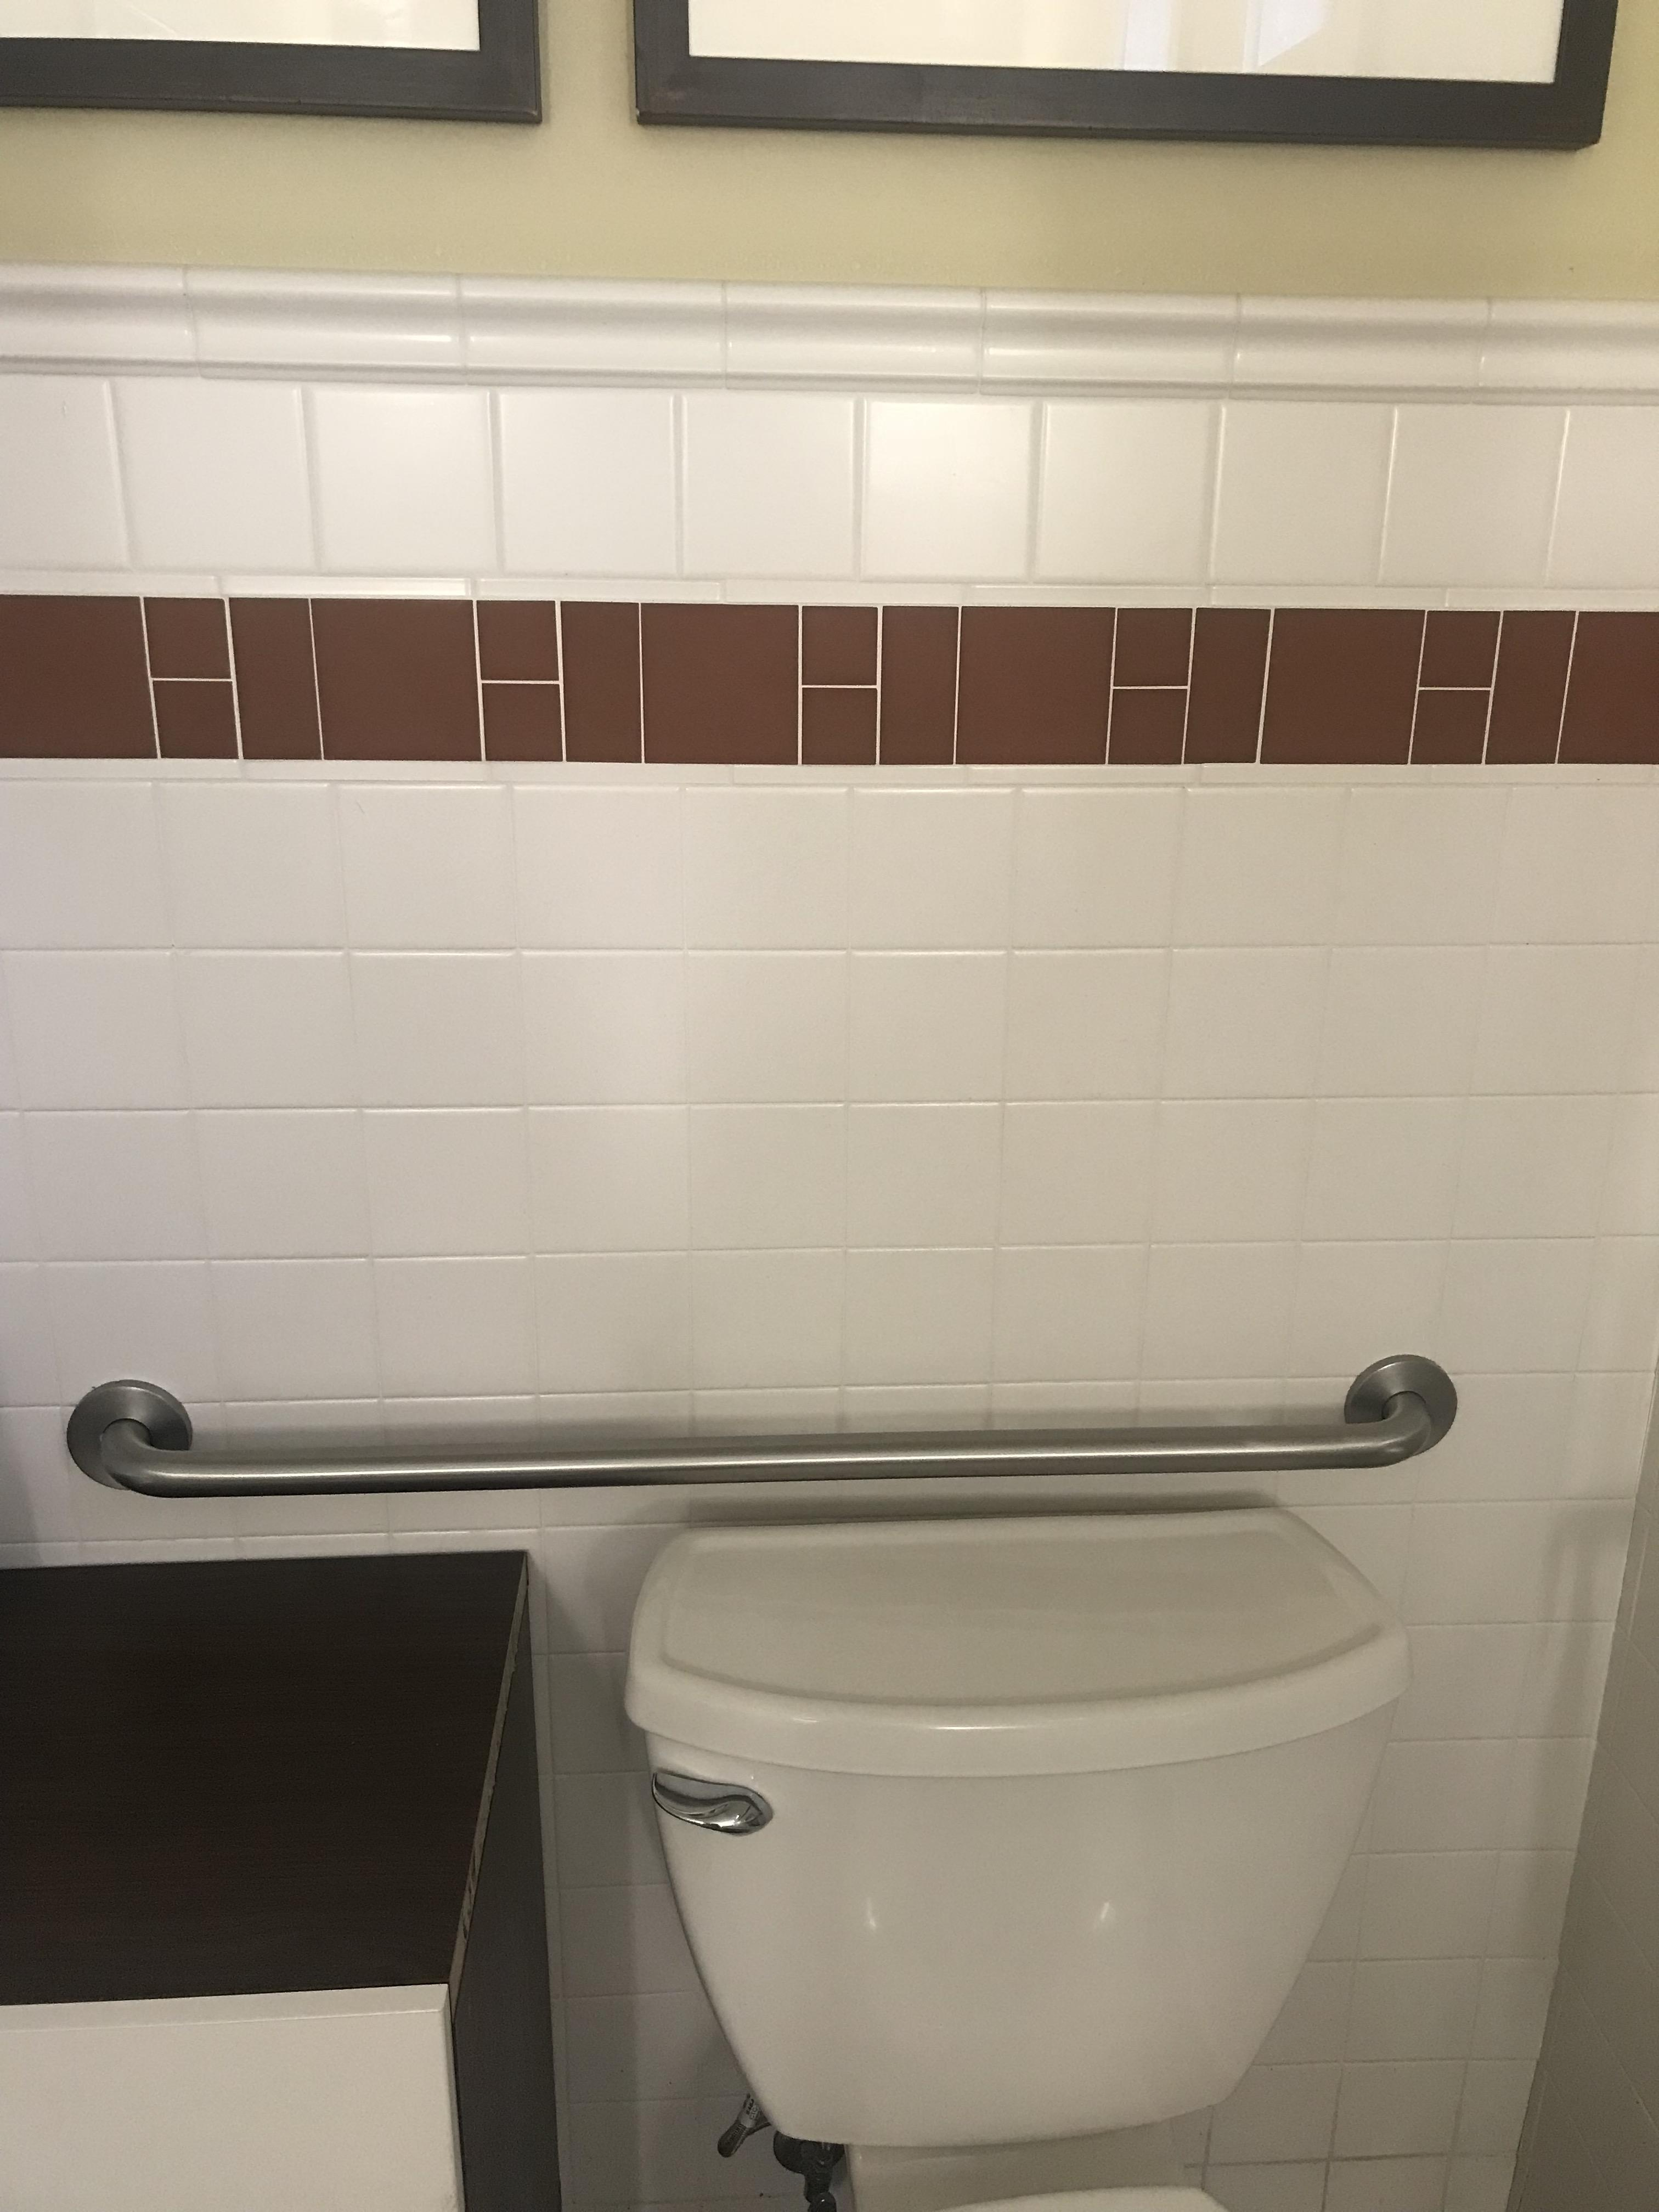 the tile backsplash in